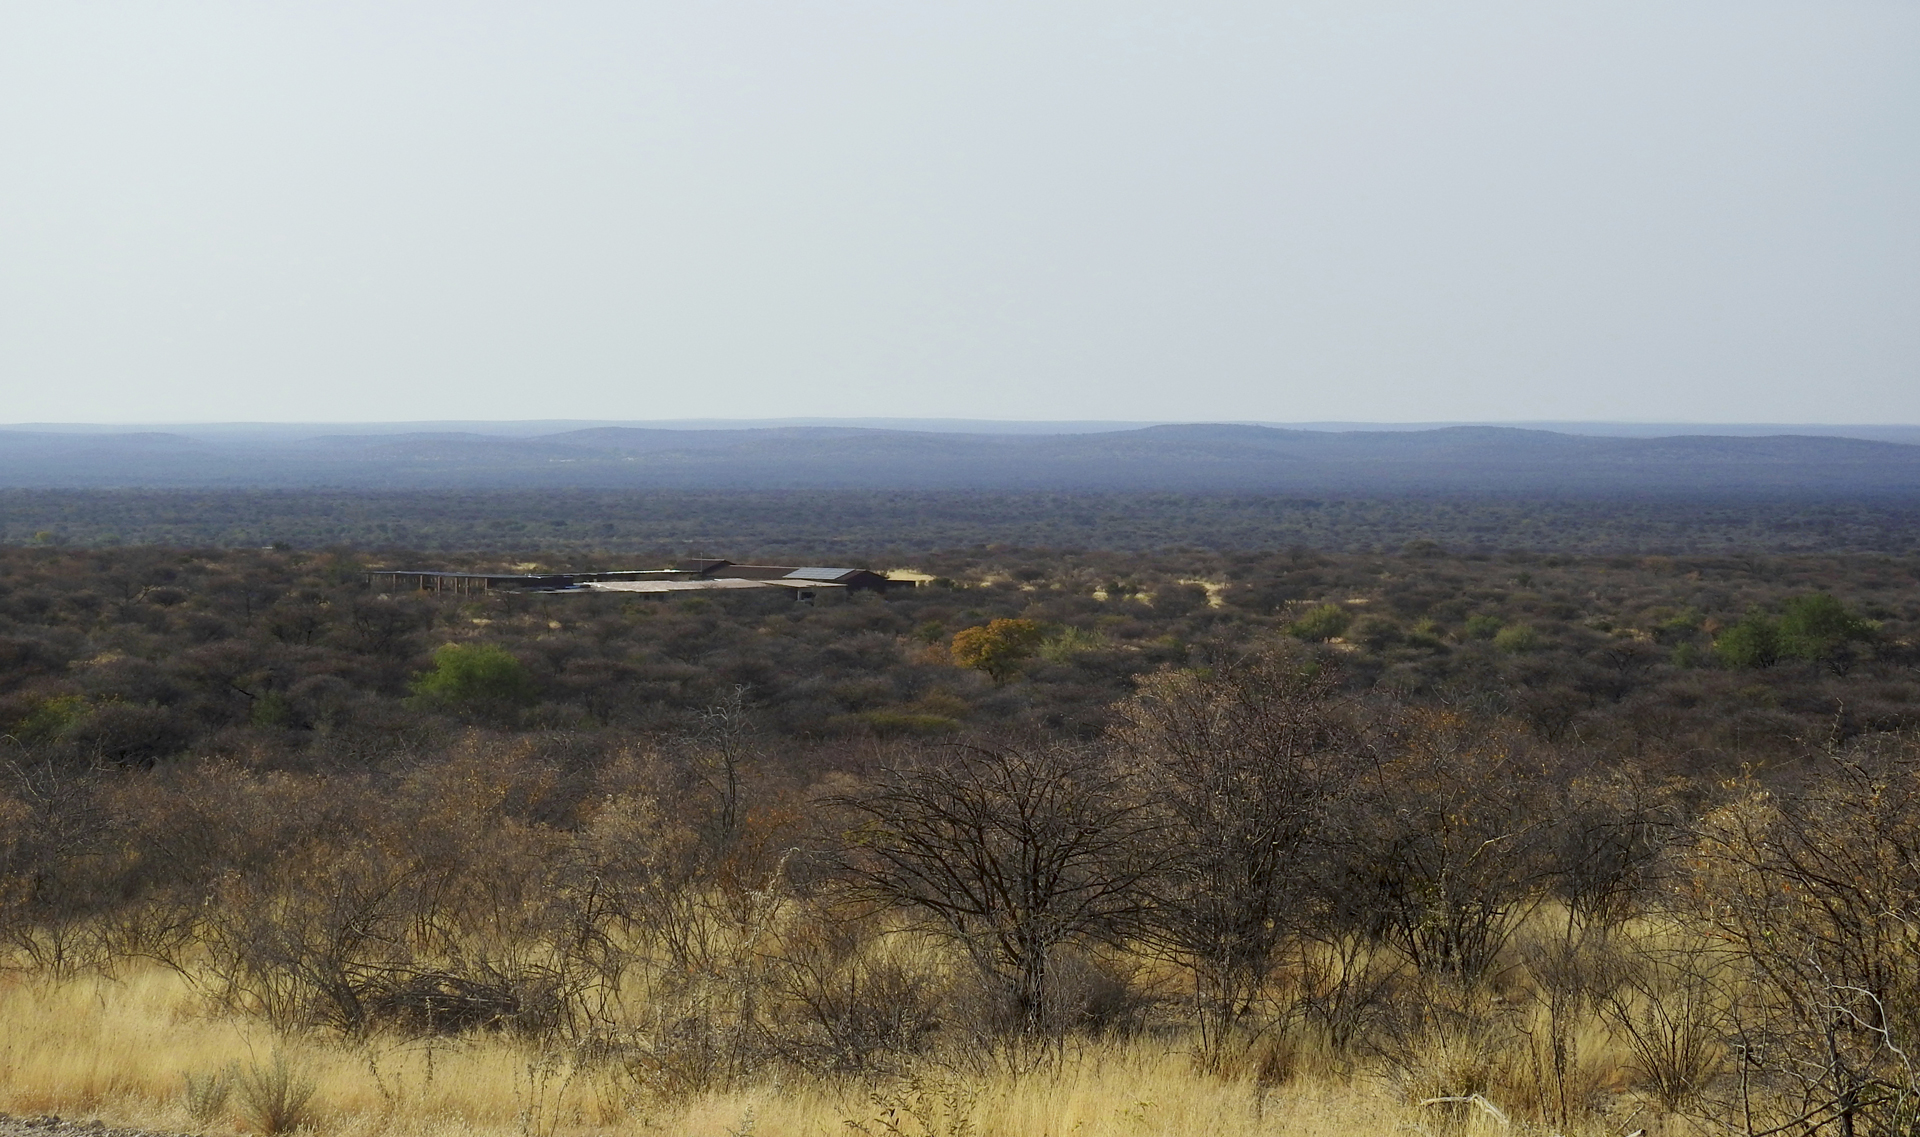 Landscape showing REST centre in Namibia